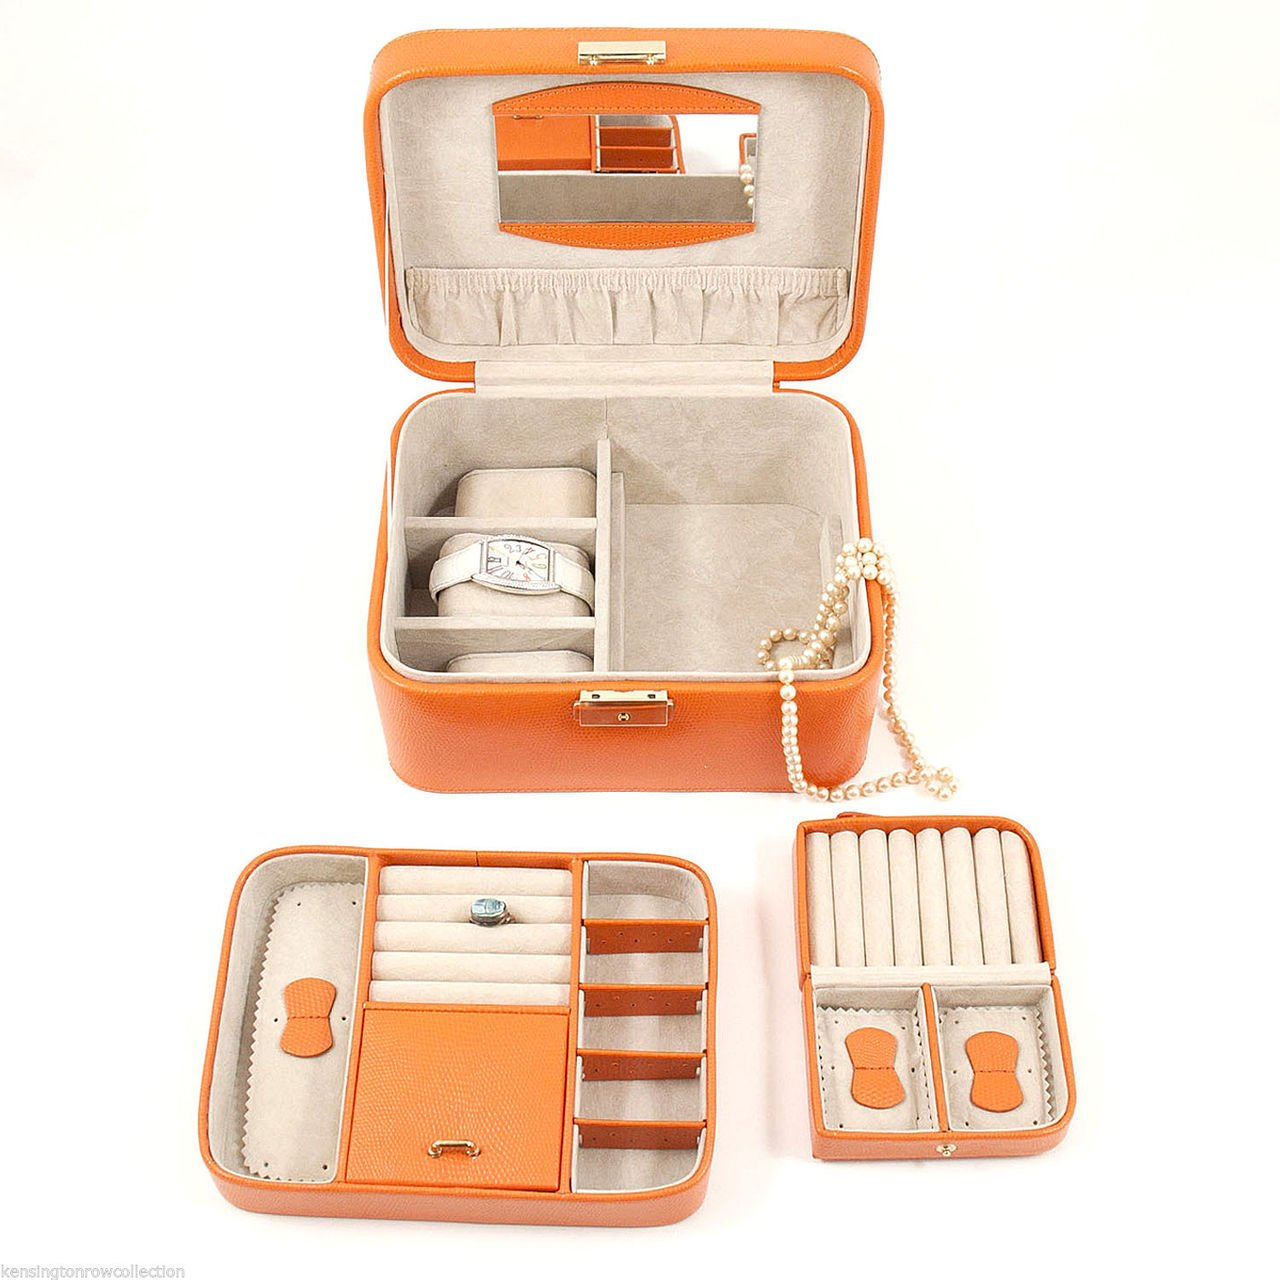 ''ESSEX'' ORANGE LEATHER JEWELRY BOX - REMOVABLE VALET & TRAVEL CASE